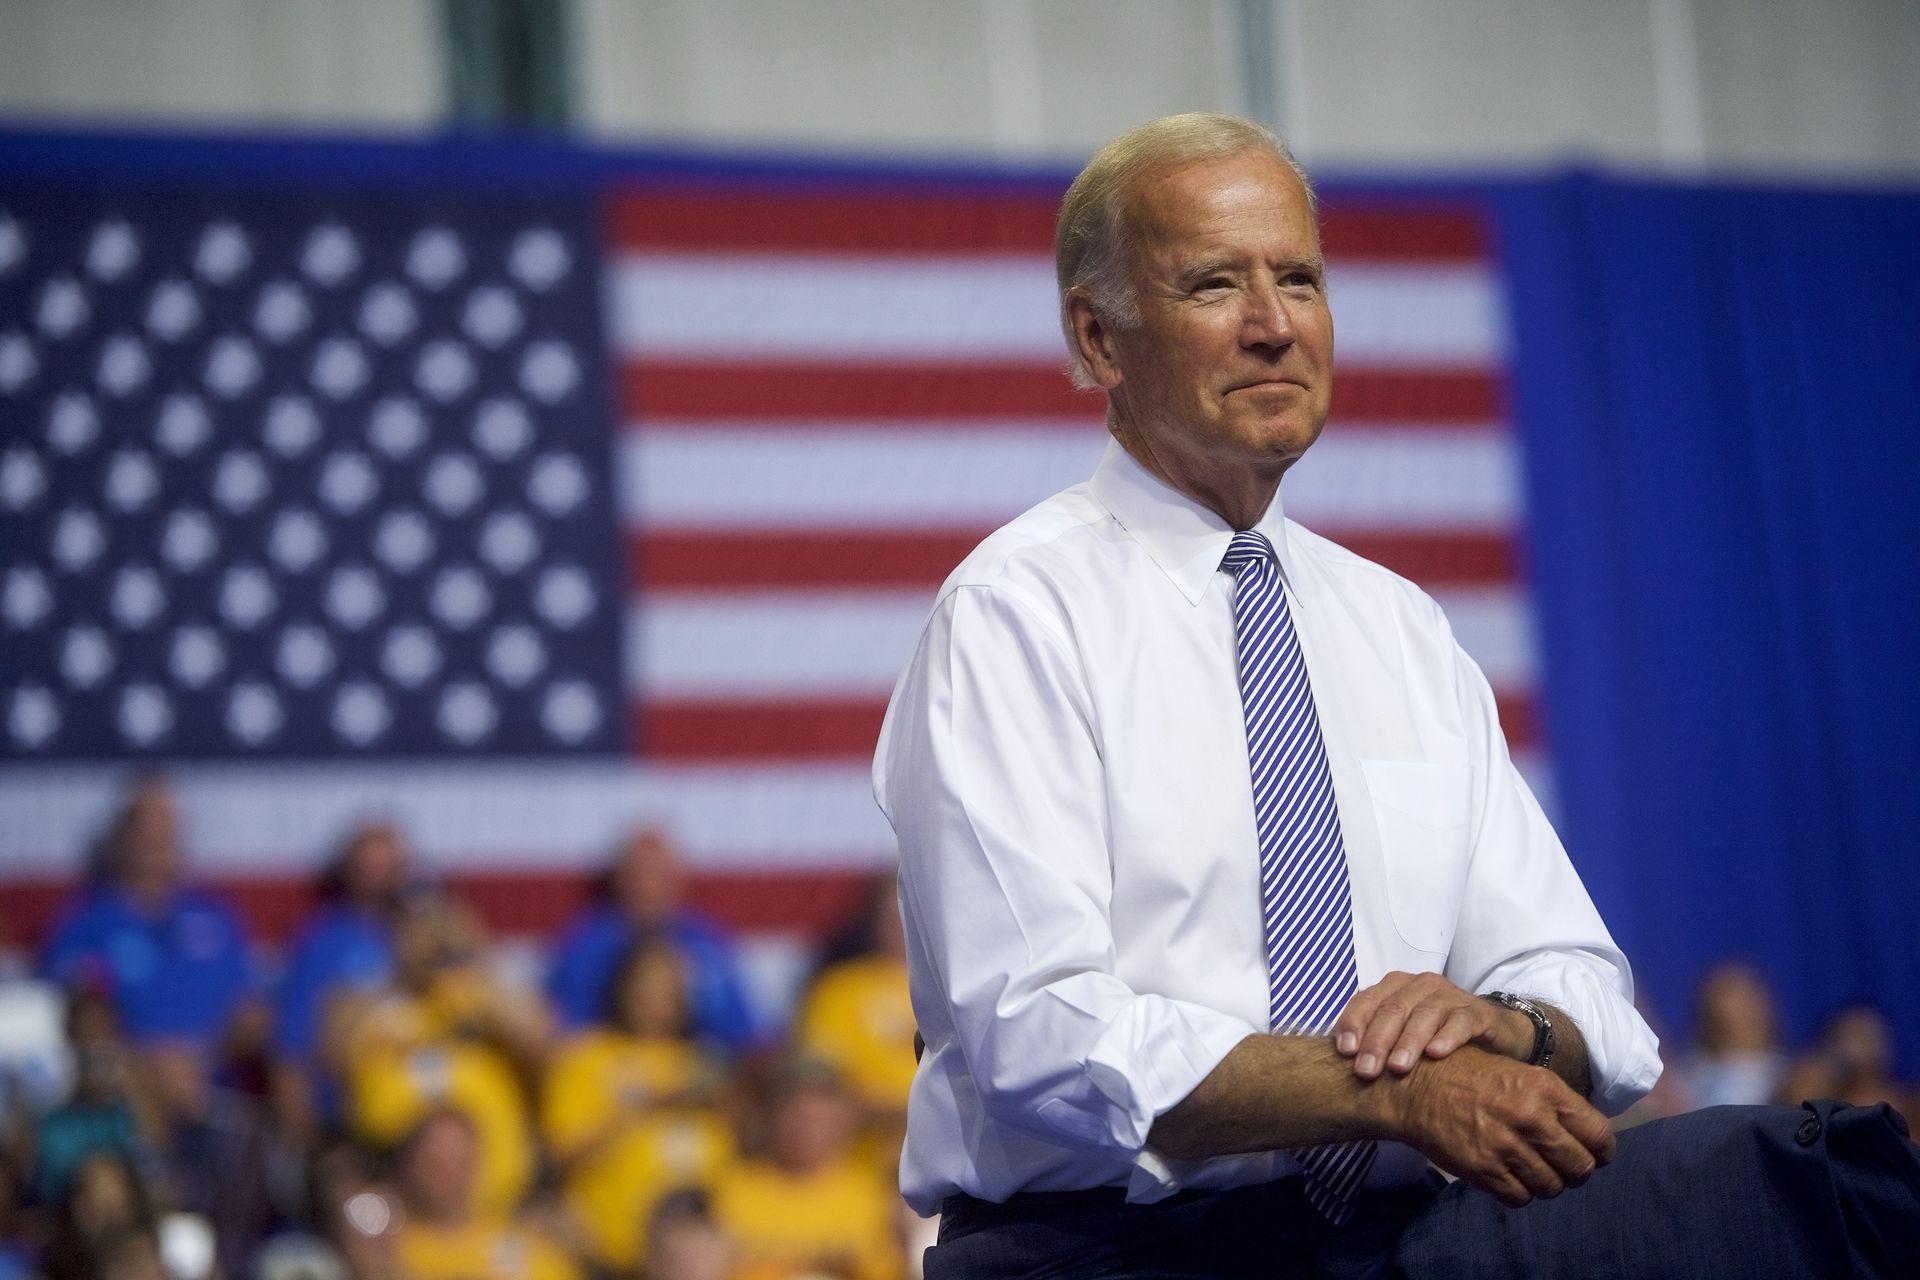 Joe Biden on the issues, in under 500 words